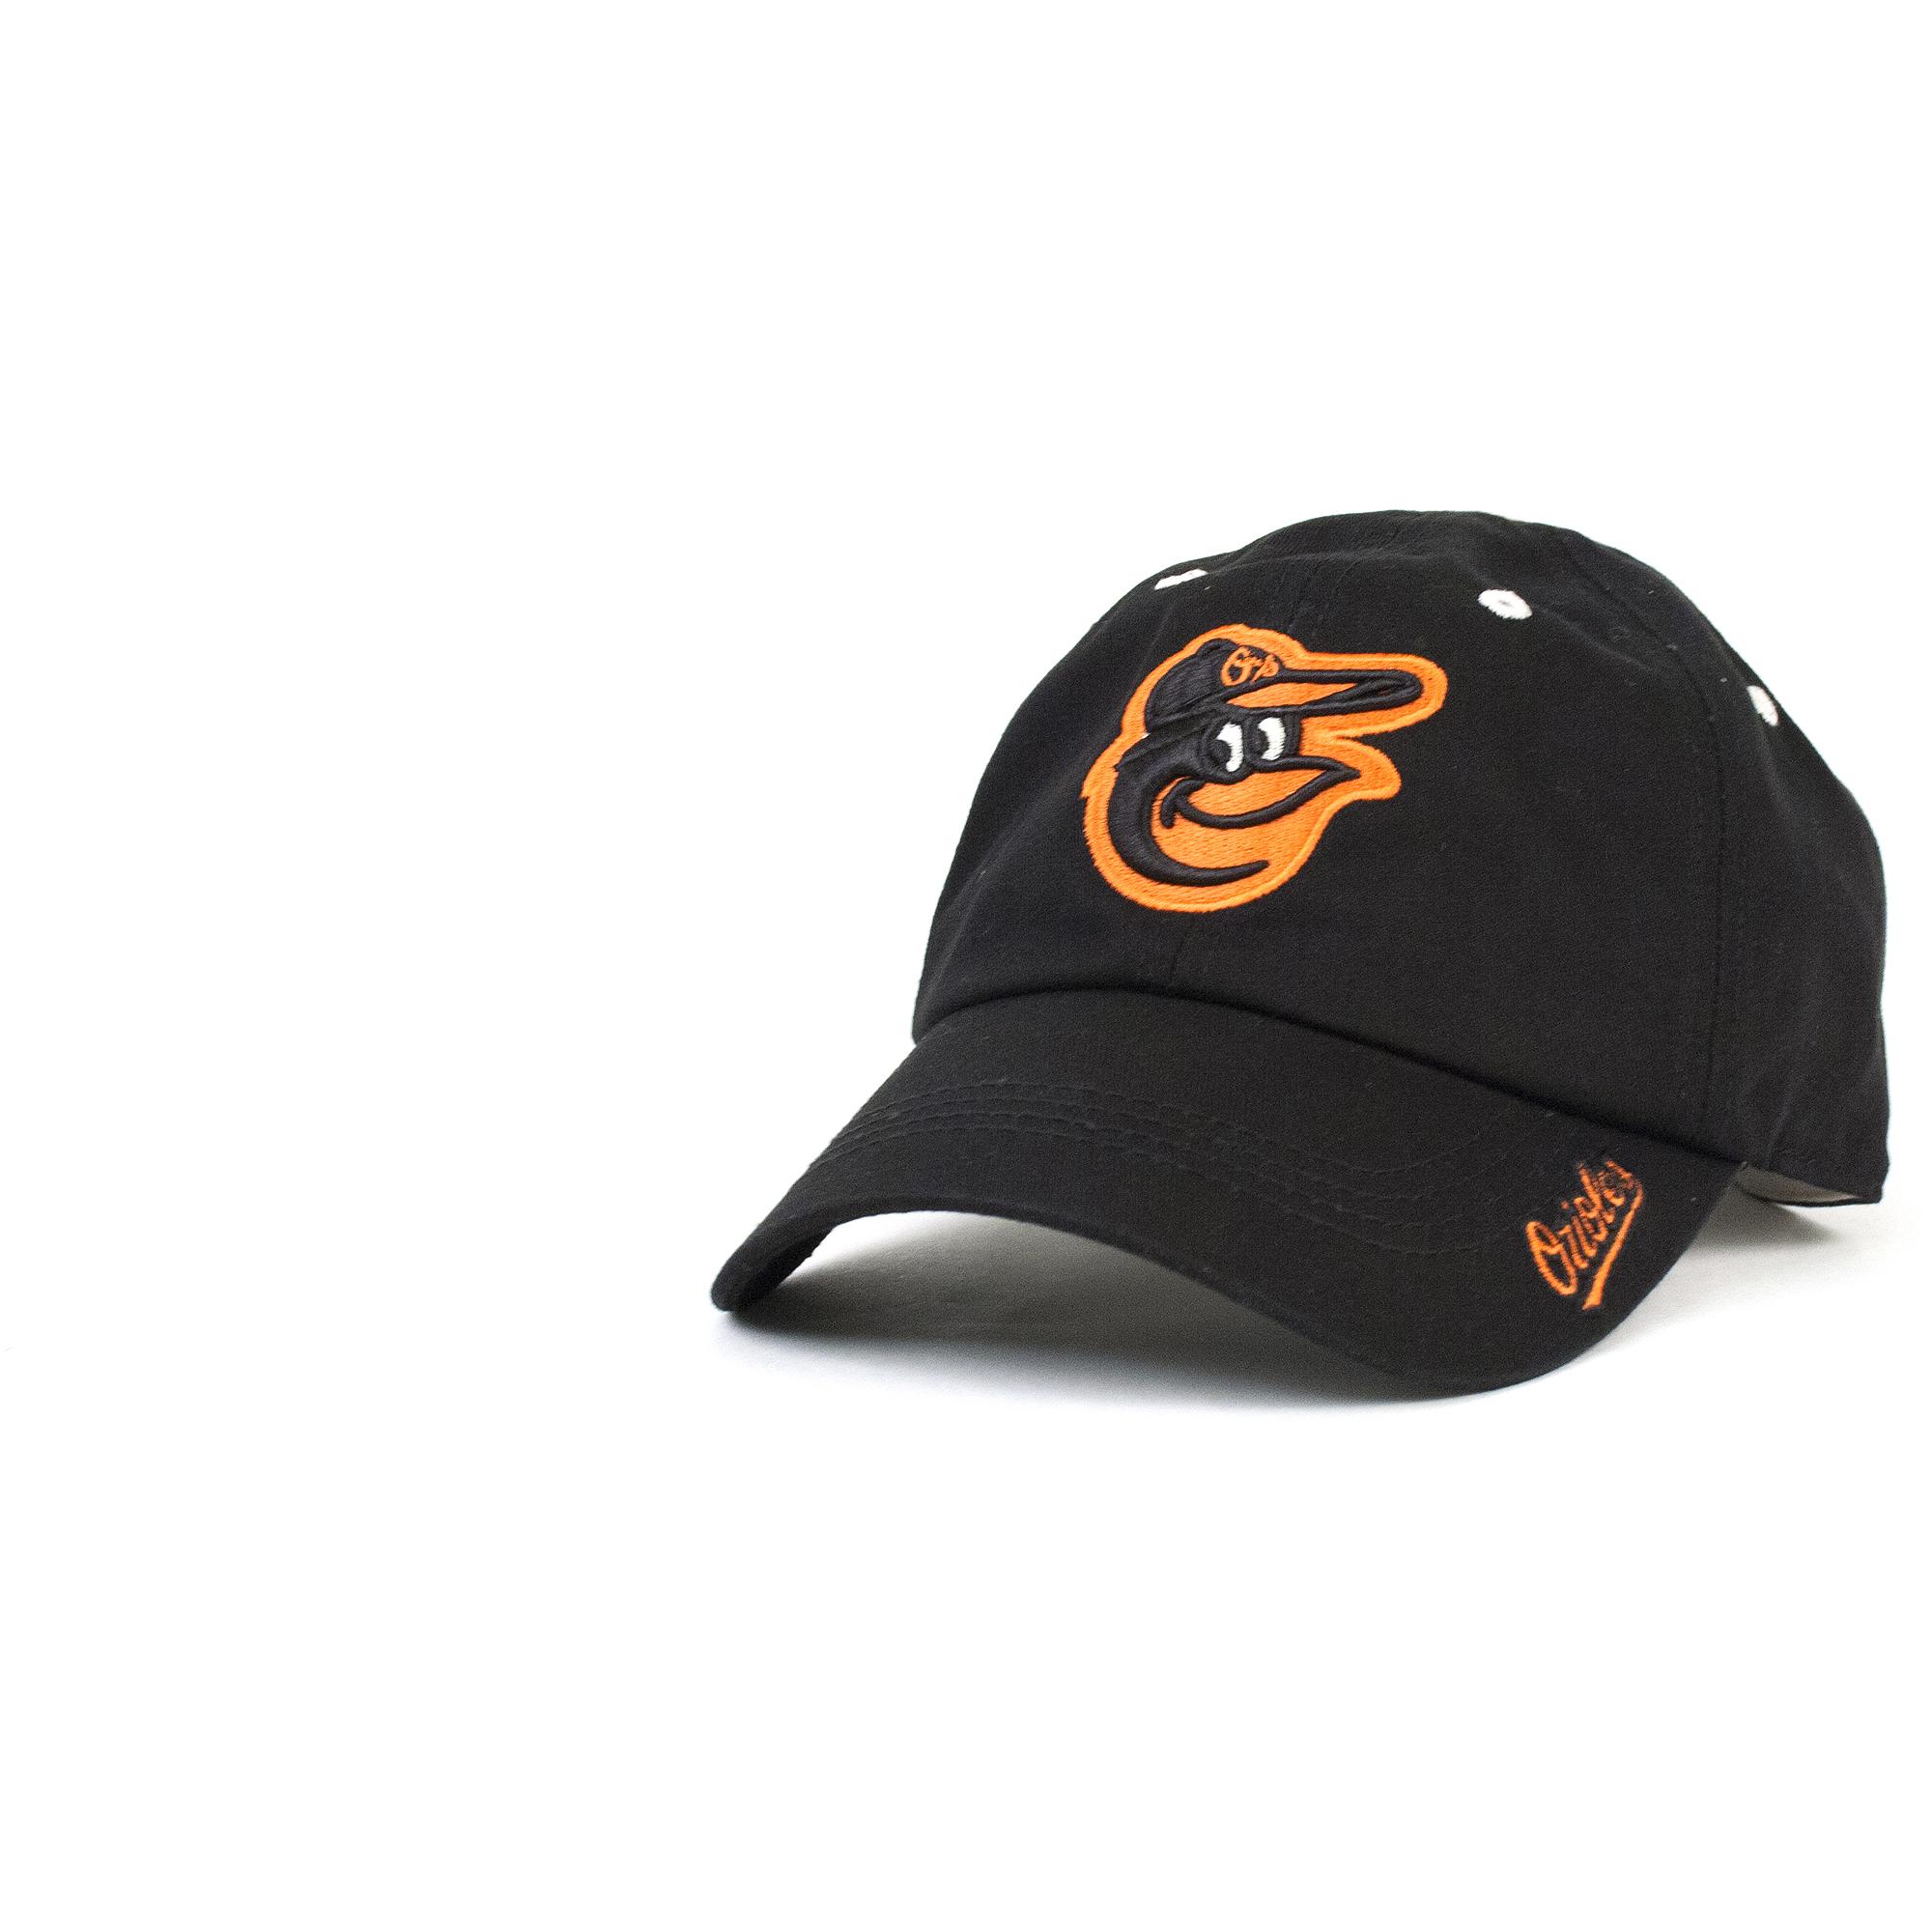 MLB Orioles Cotton Twill Cap